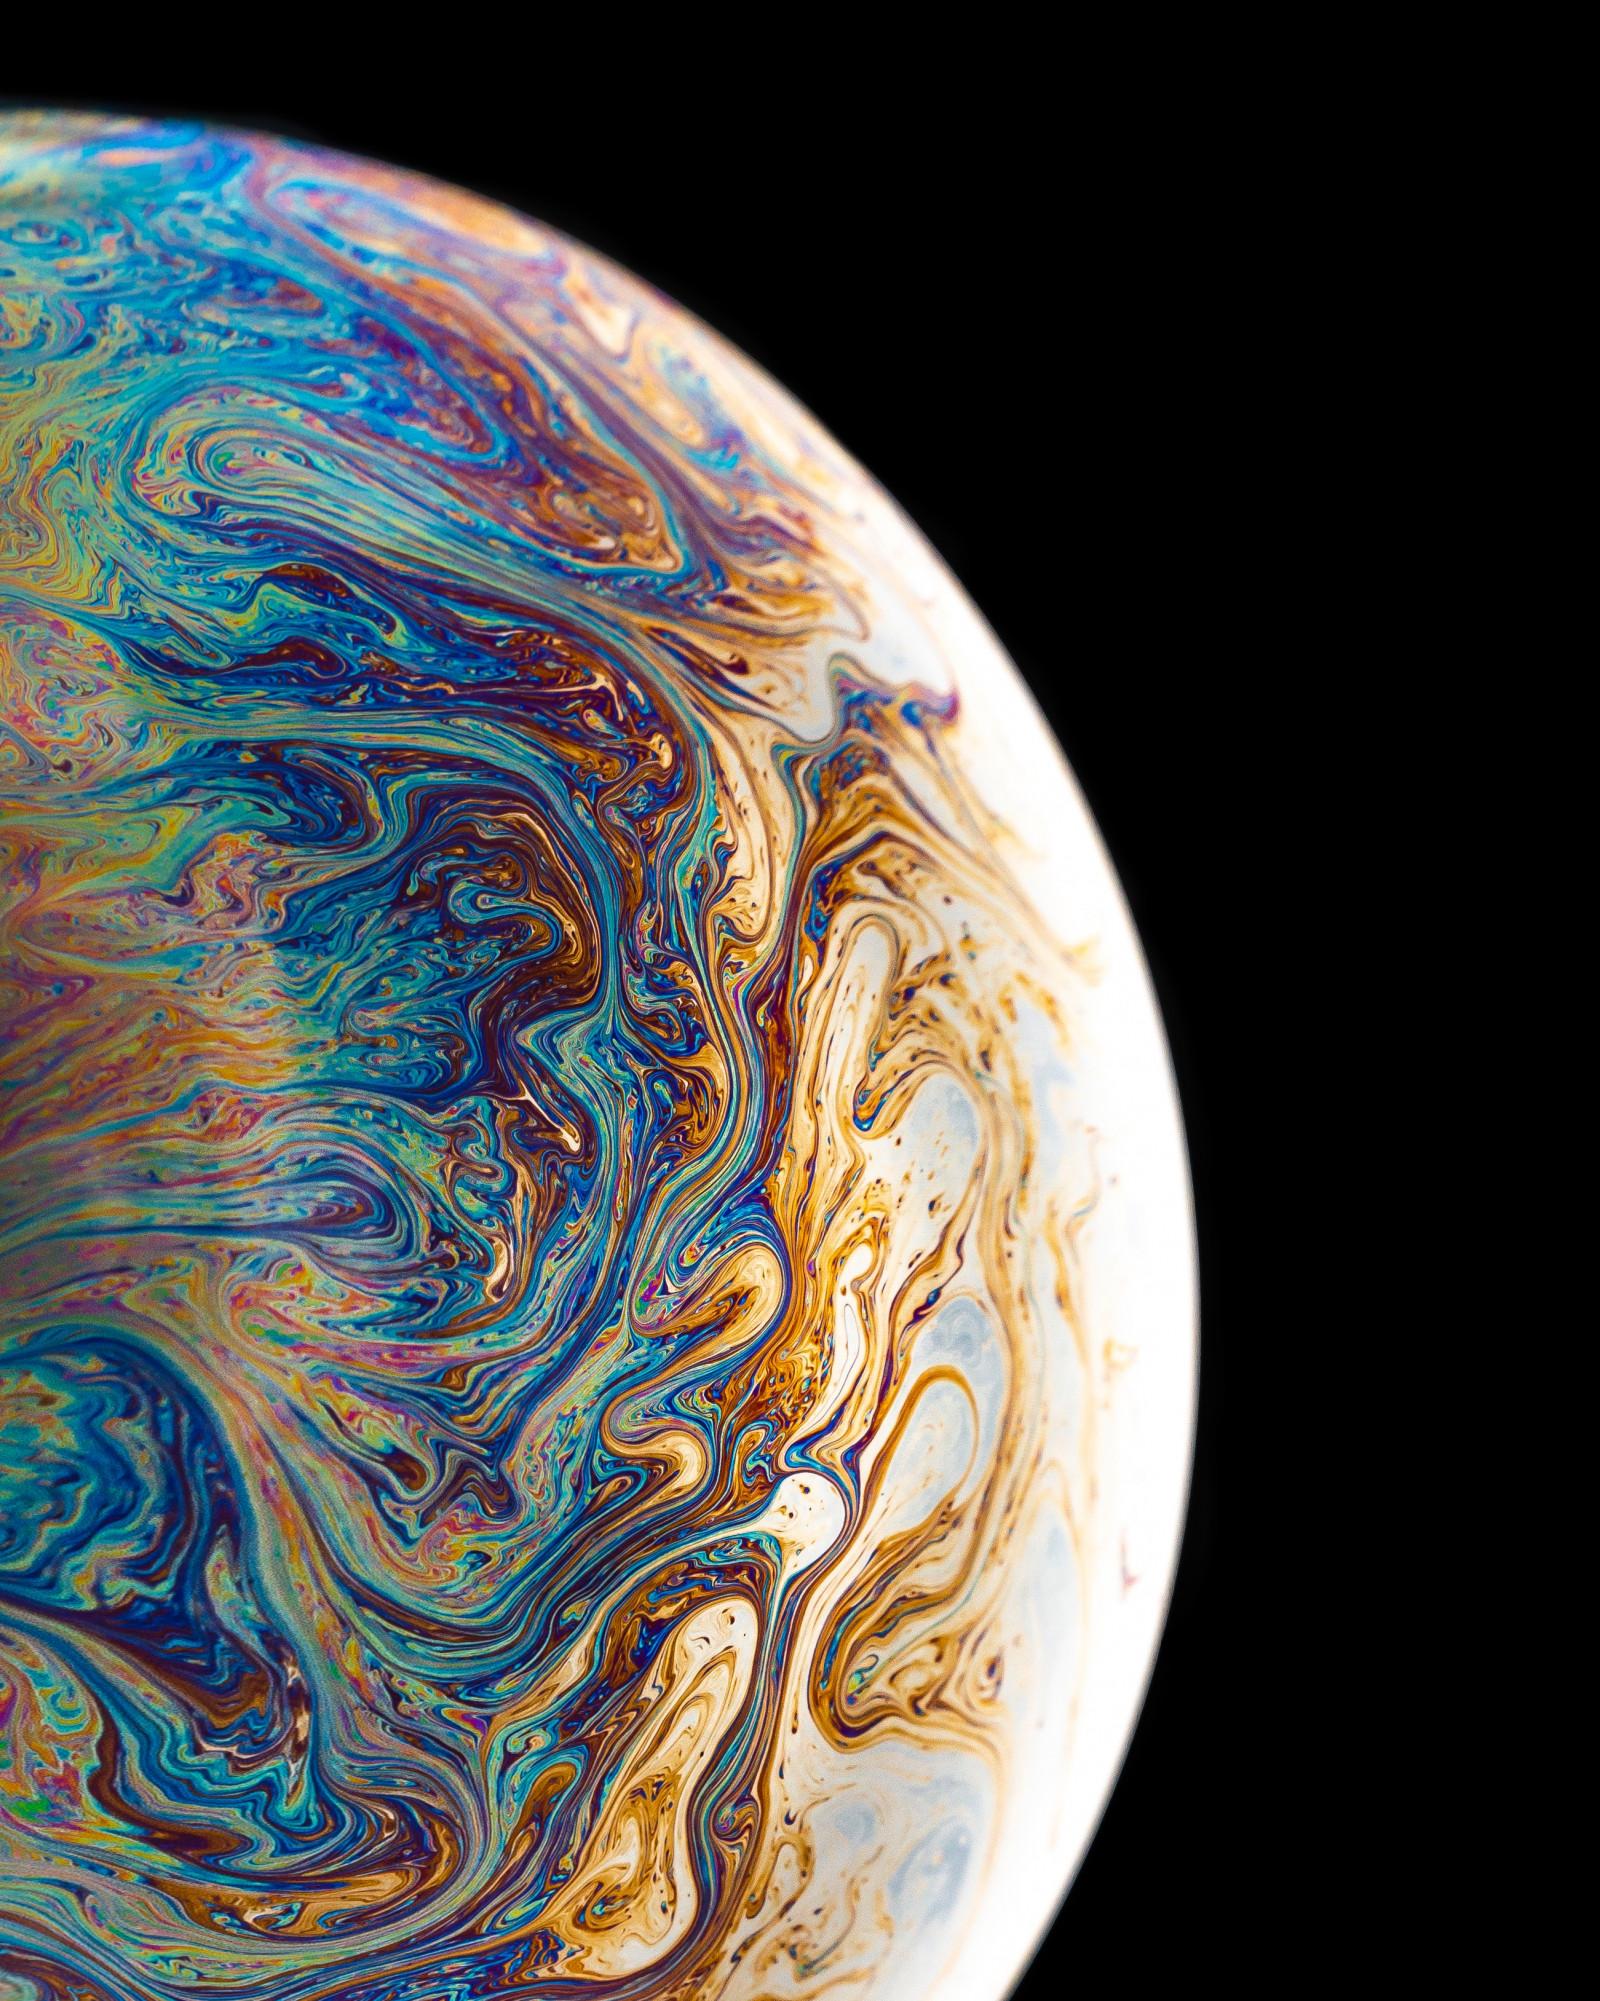 Wallpaper : nature, water, iPhone X, iphone xs, liquid ...